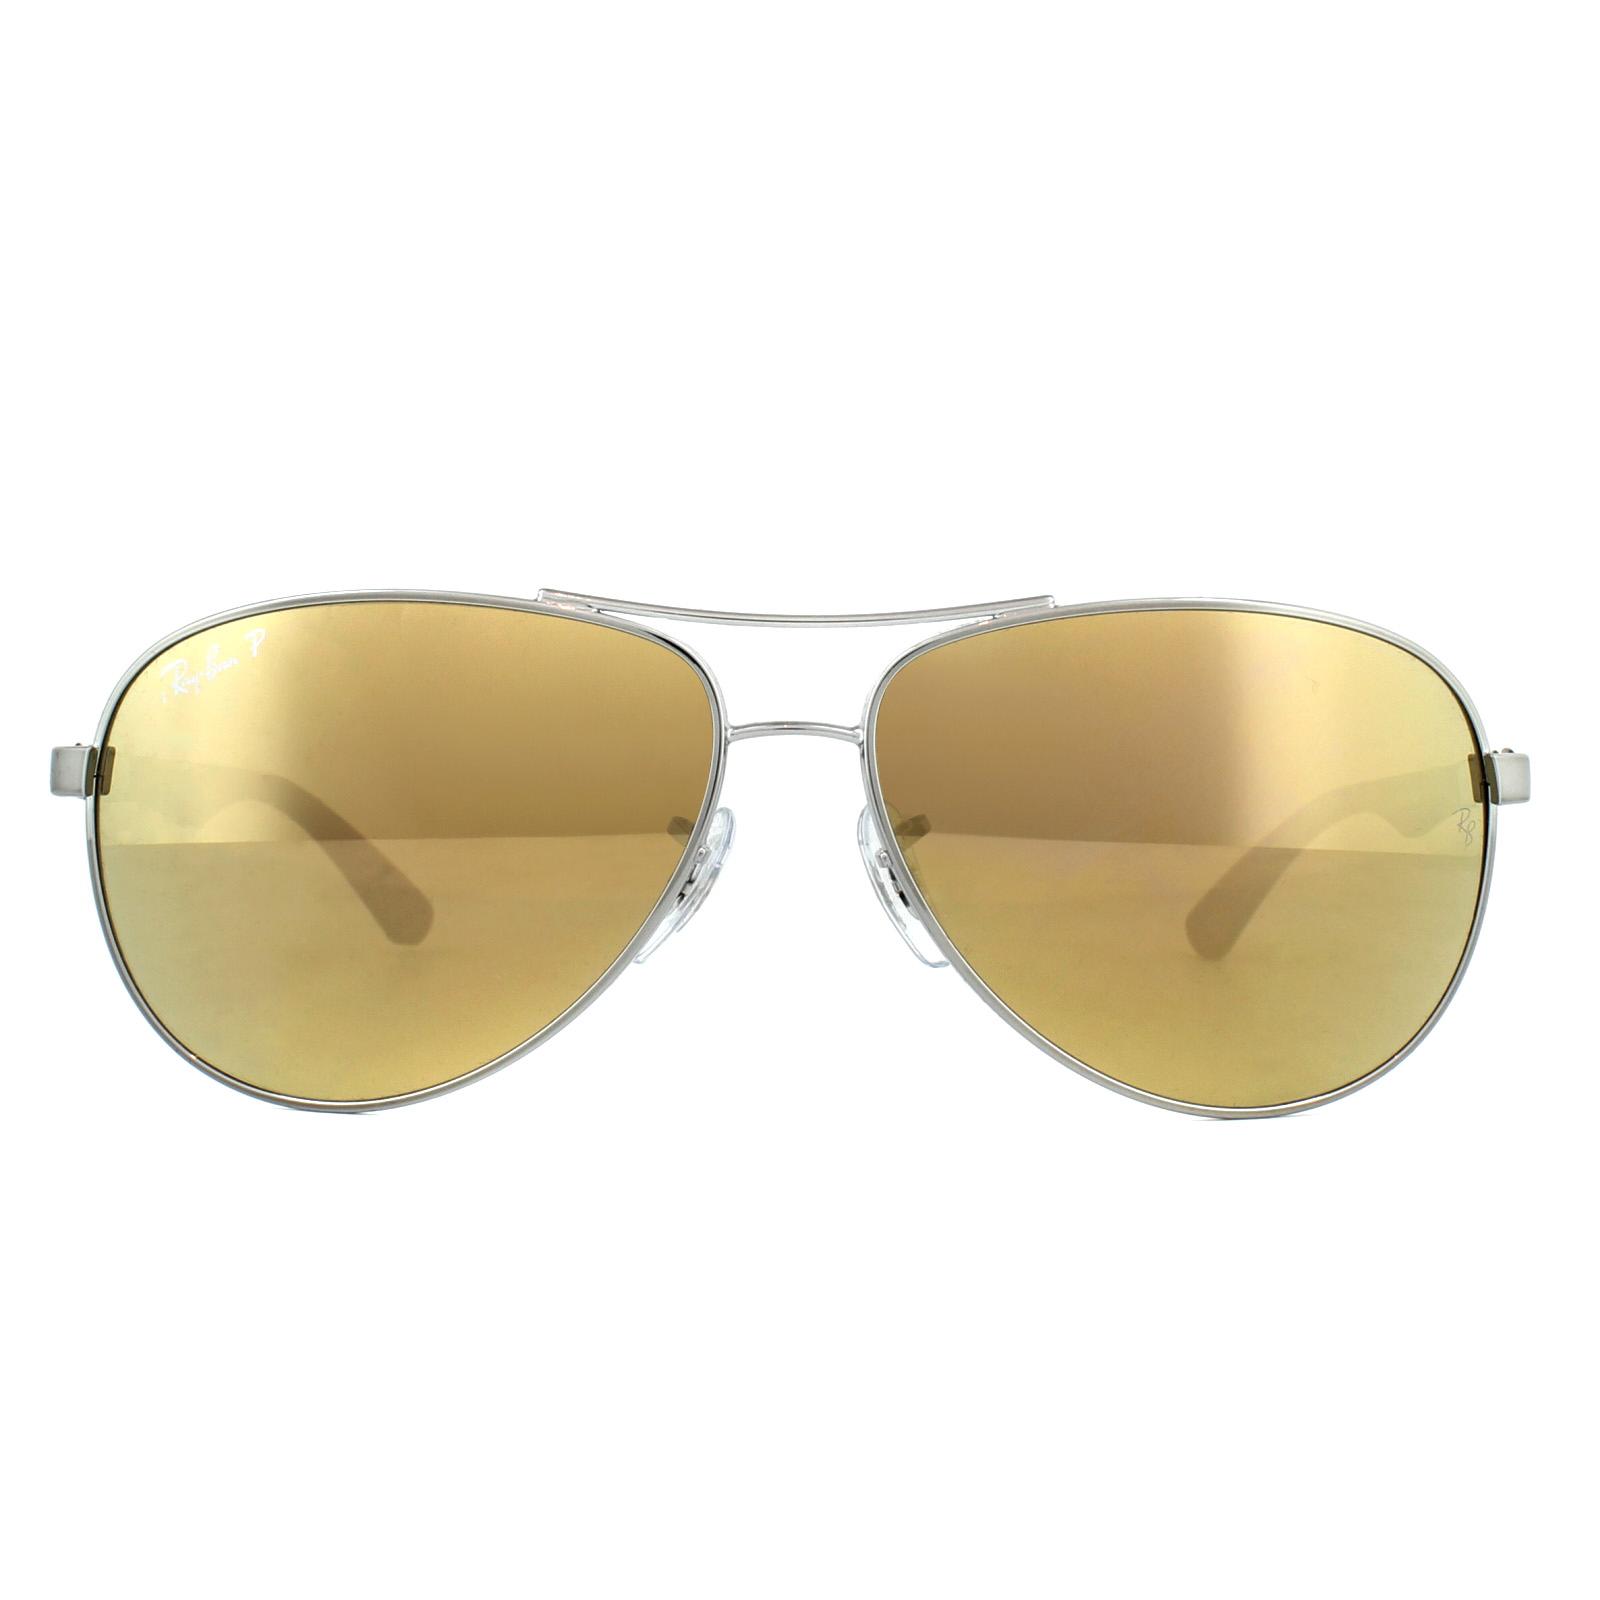 2630f634c8 Sentinel Ray-Ban Sunglasses 8313 004 N3 Gunmetal Polarized Gold Mirror